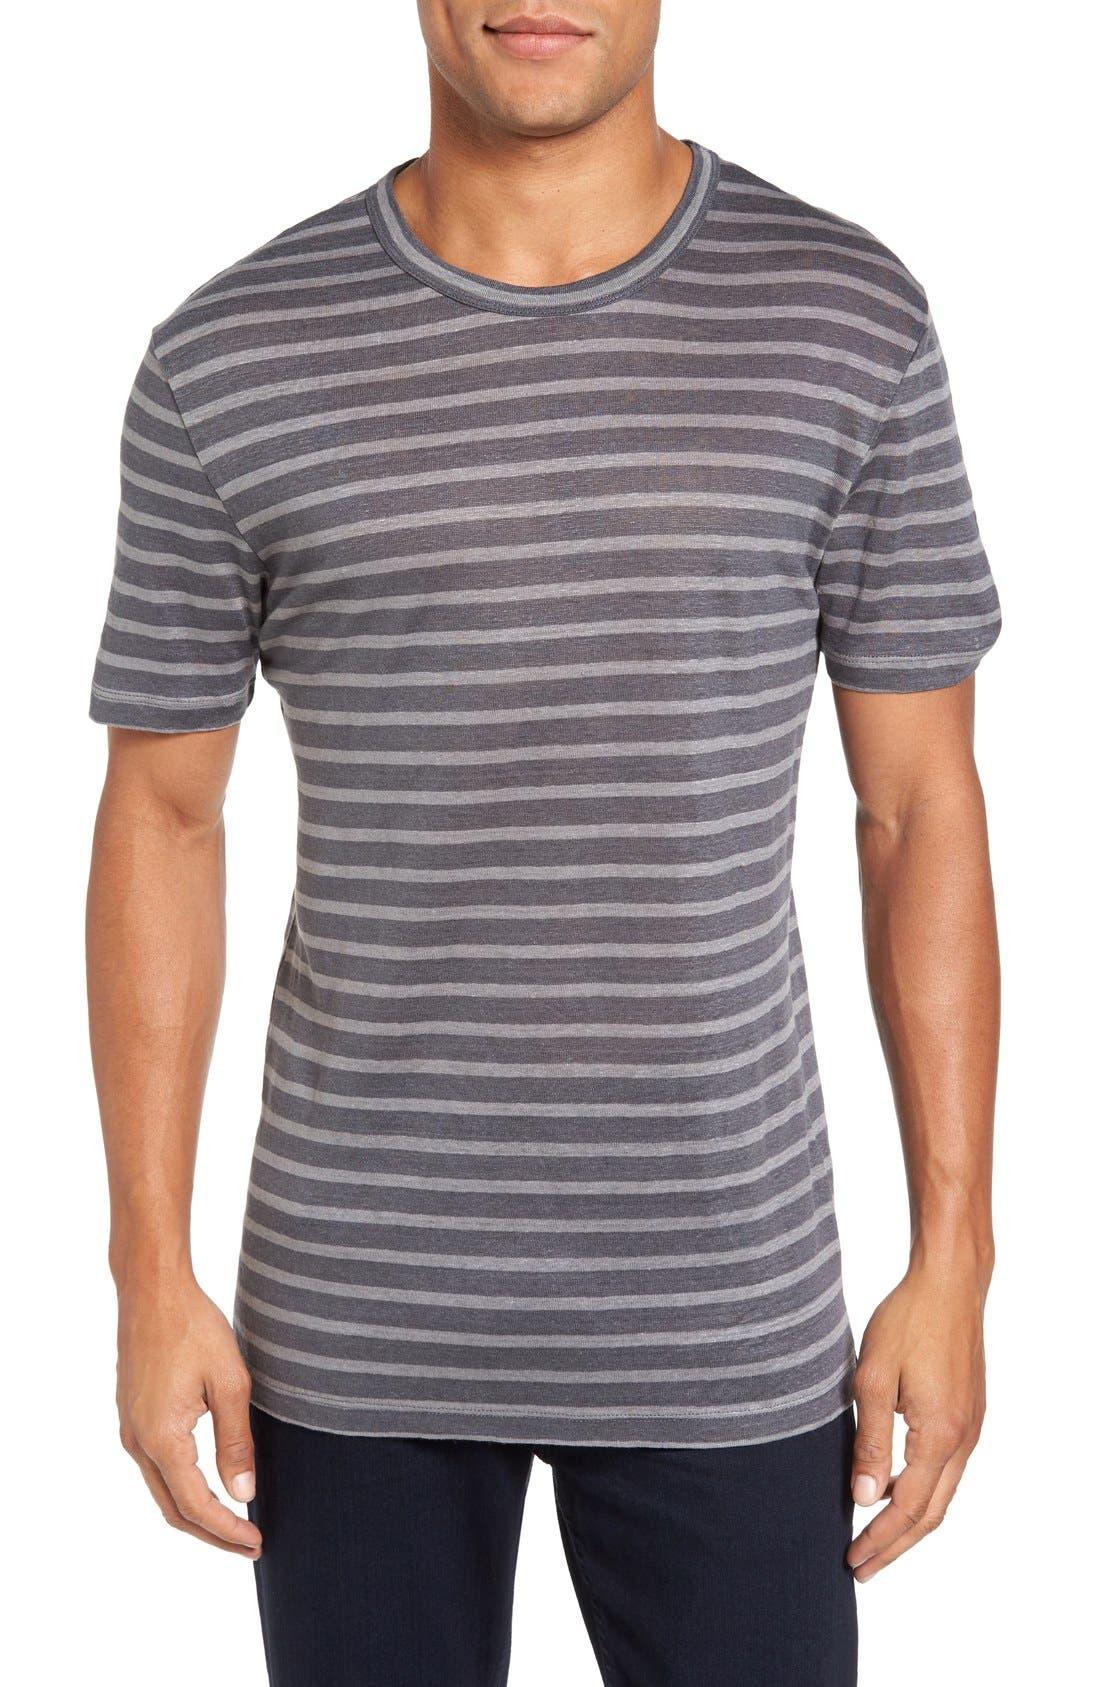 Slate & Stone Stripe Linen T-Shirt